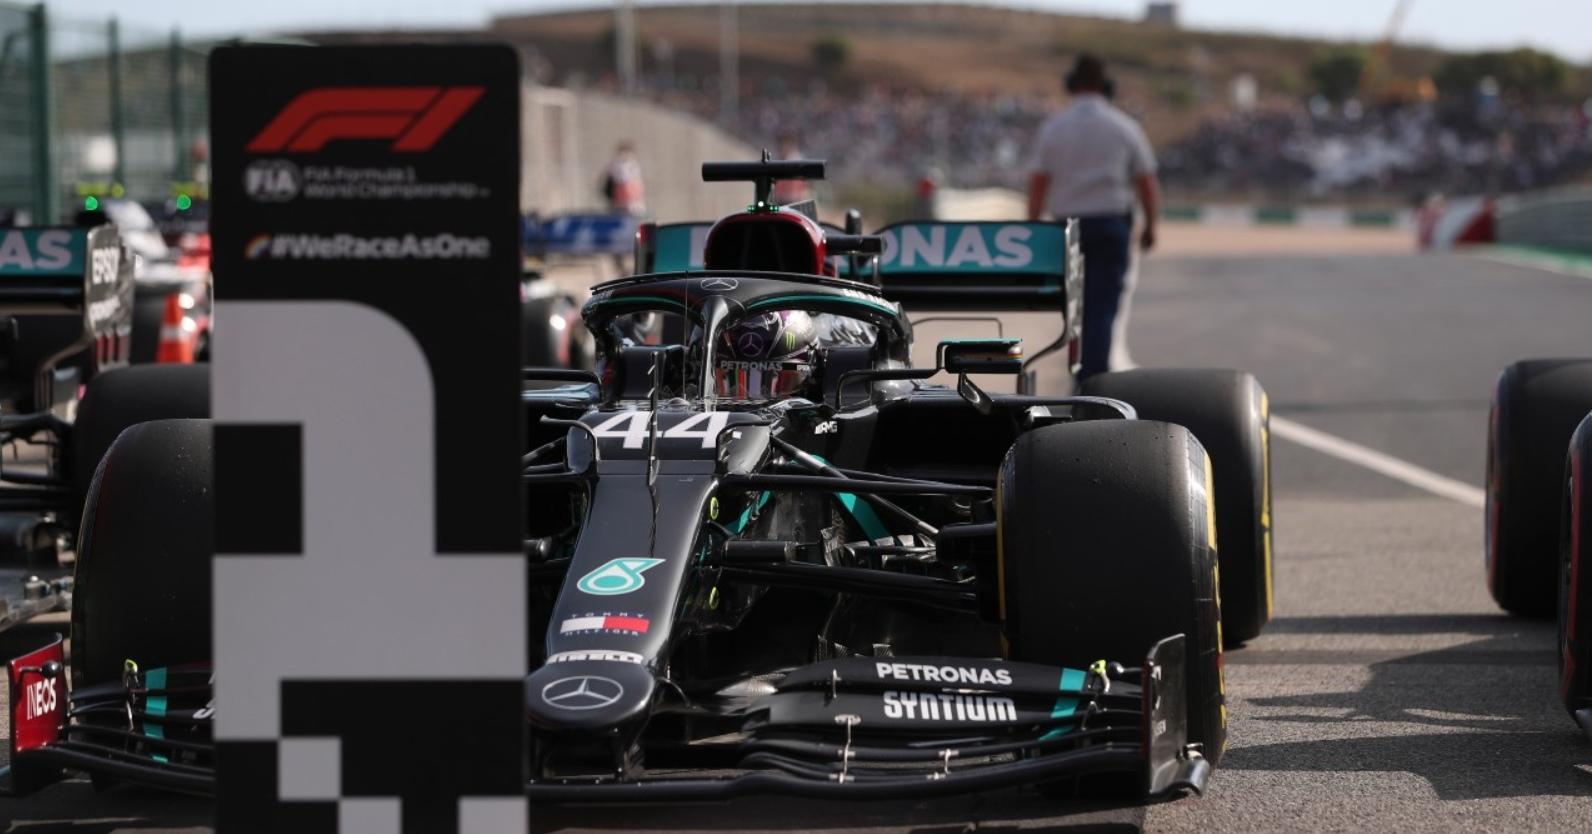 Хэмилтон вырвал поул на Гран-при Португалии, Квят стартует 13-м